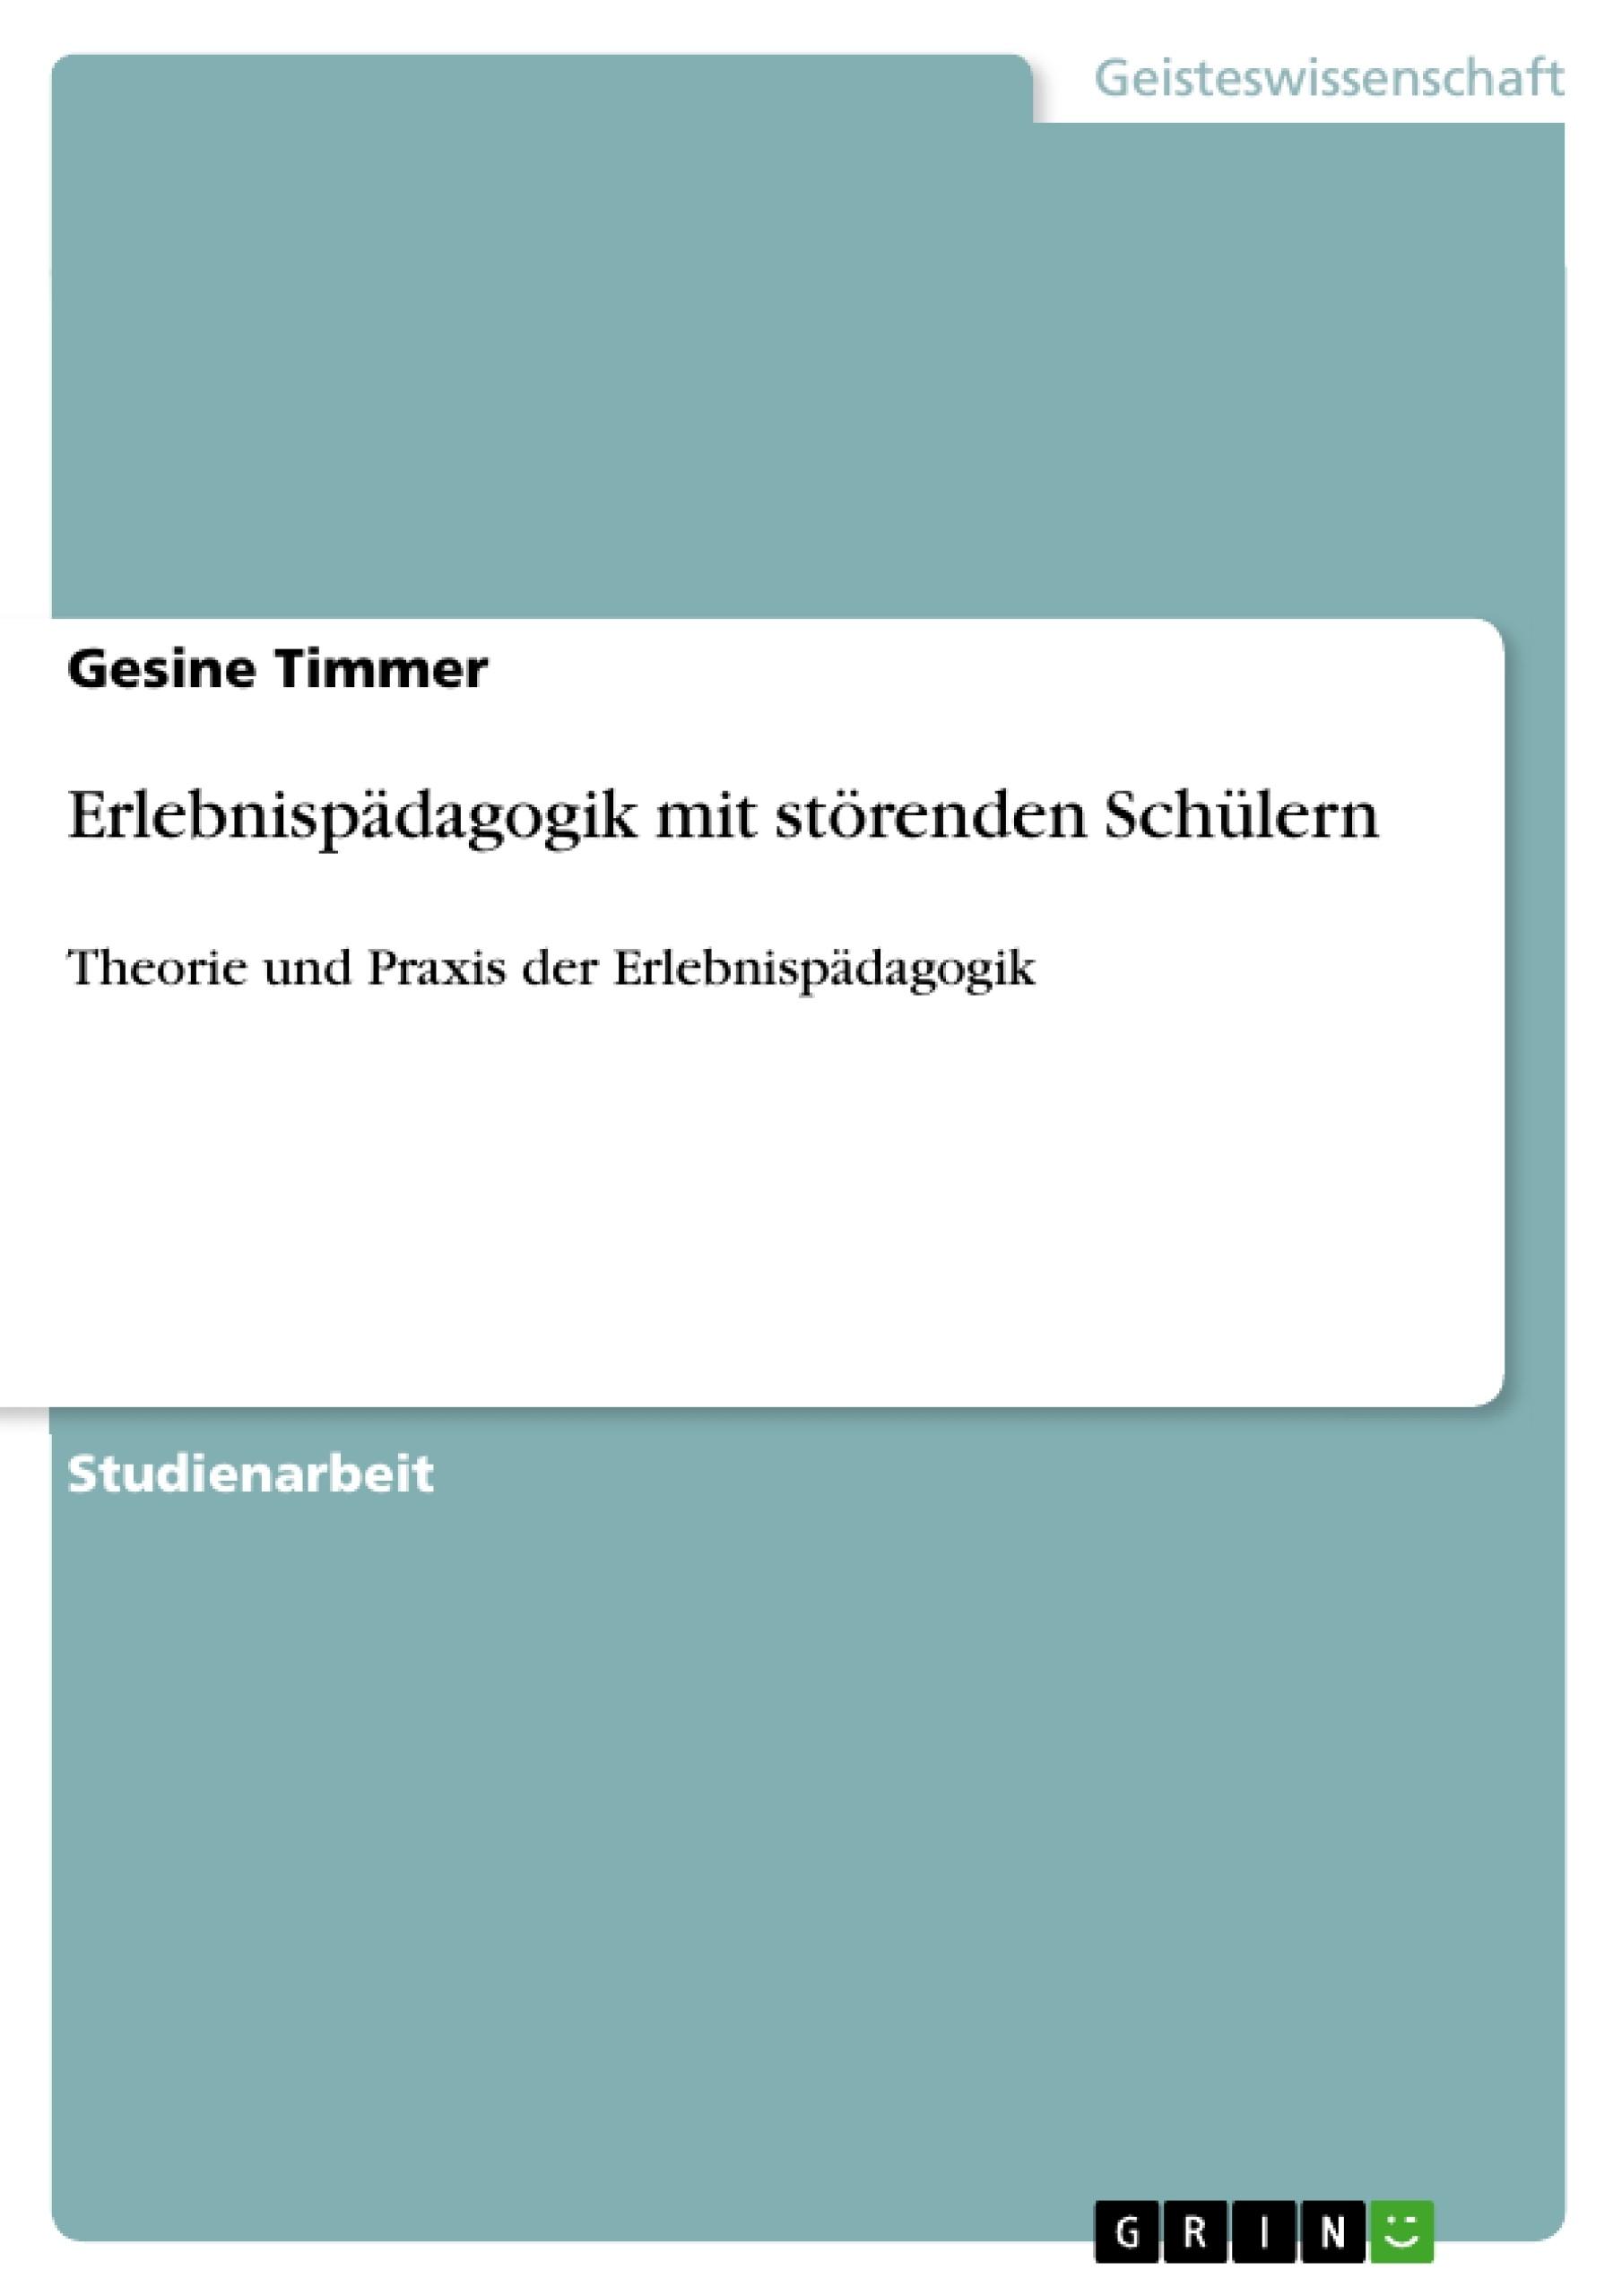 Titel: Erlebnispädagogik mit störenden Schülern